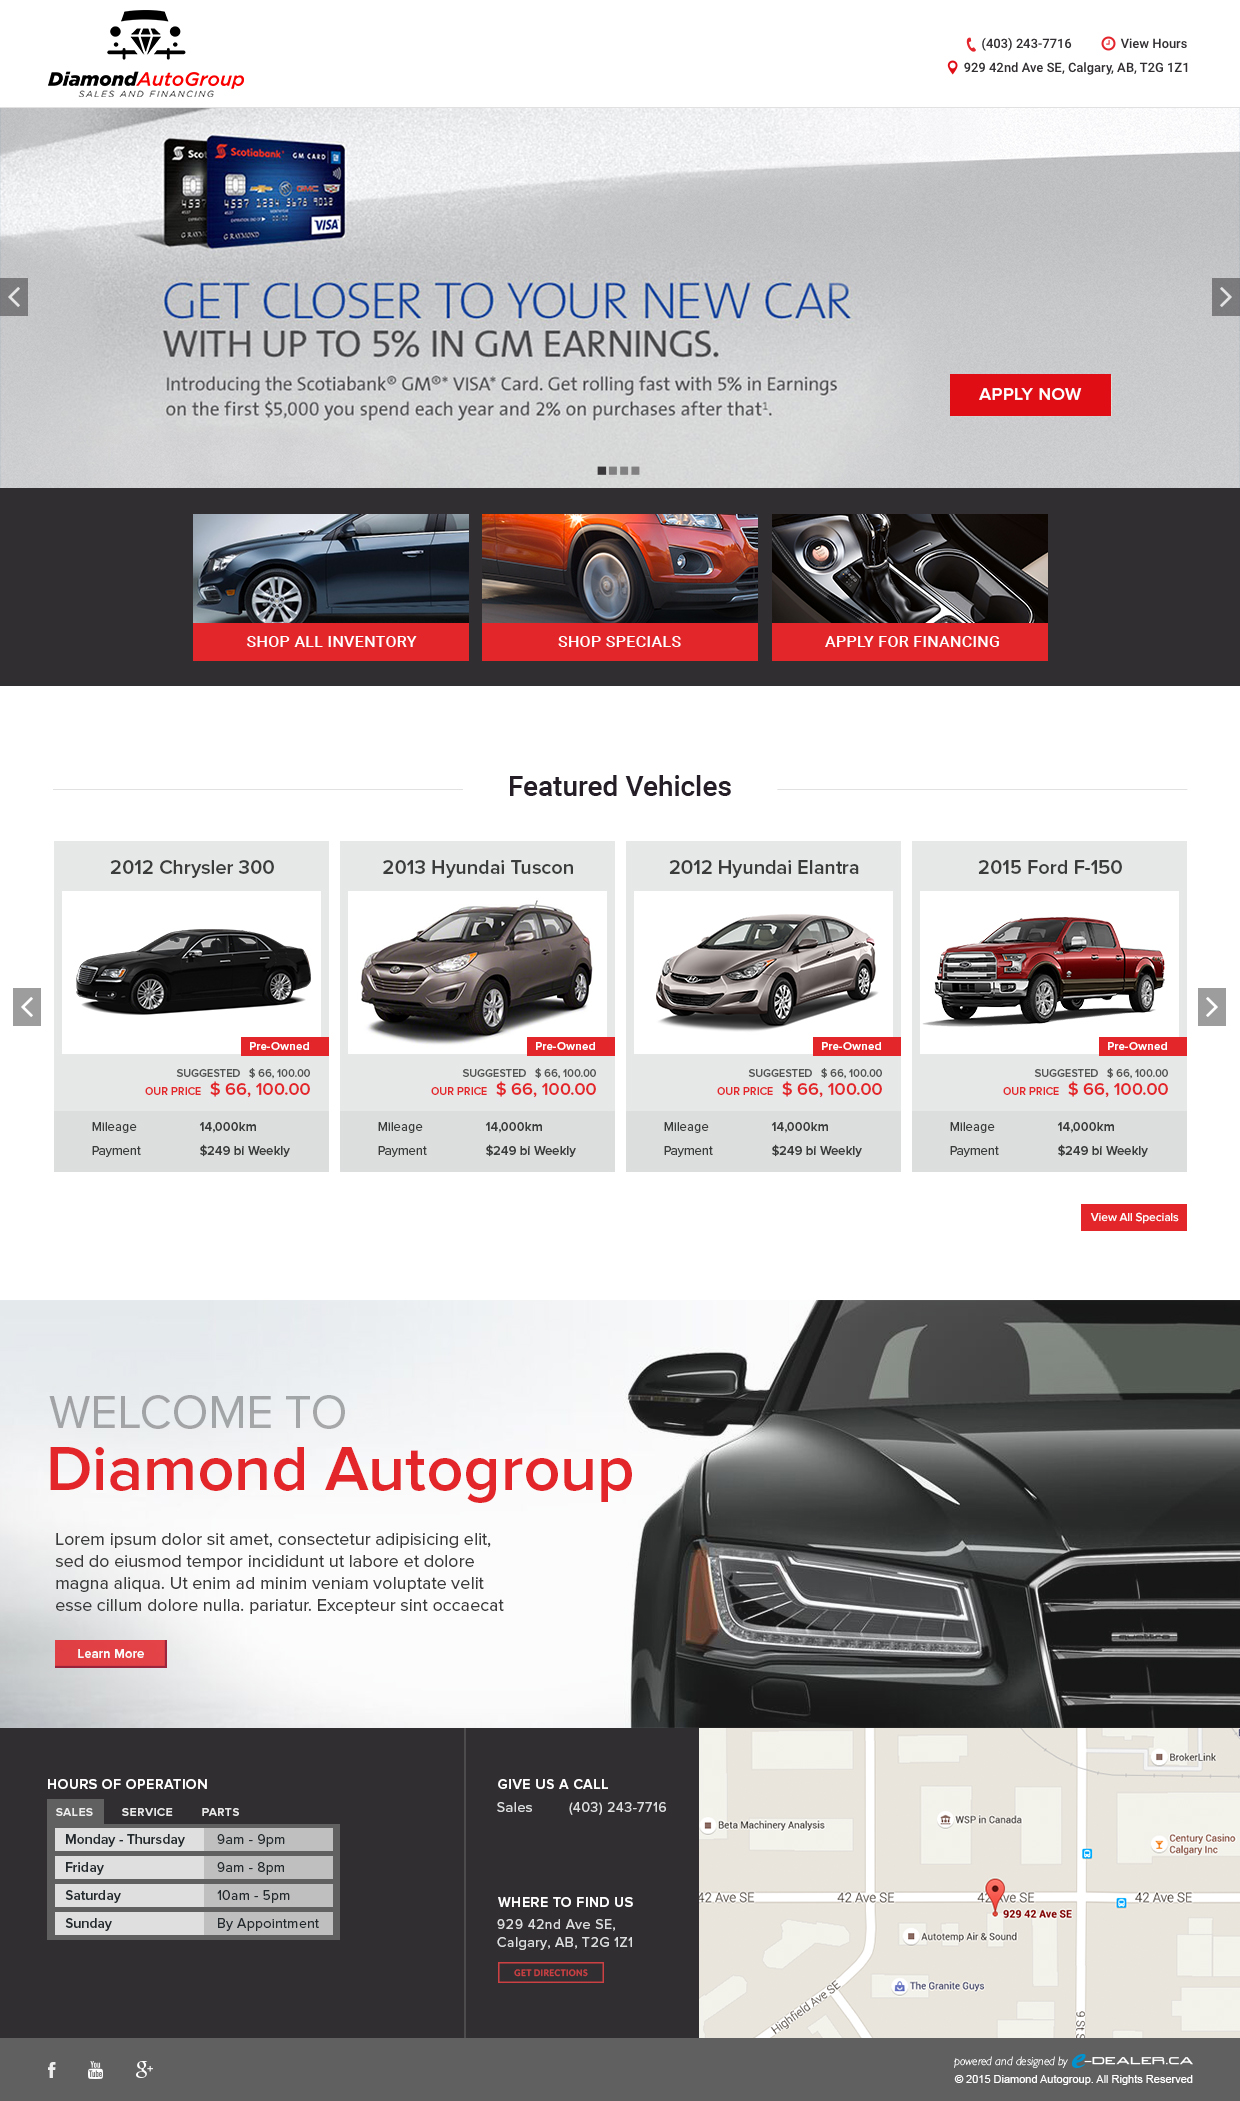 DiamondAuto-Design-final